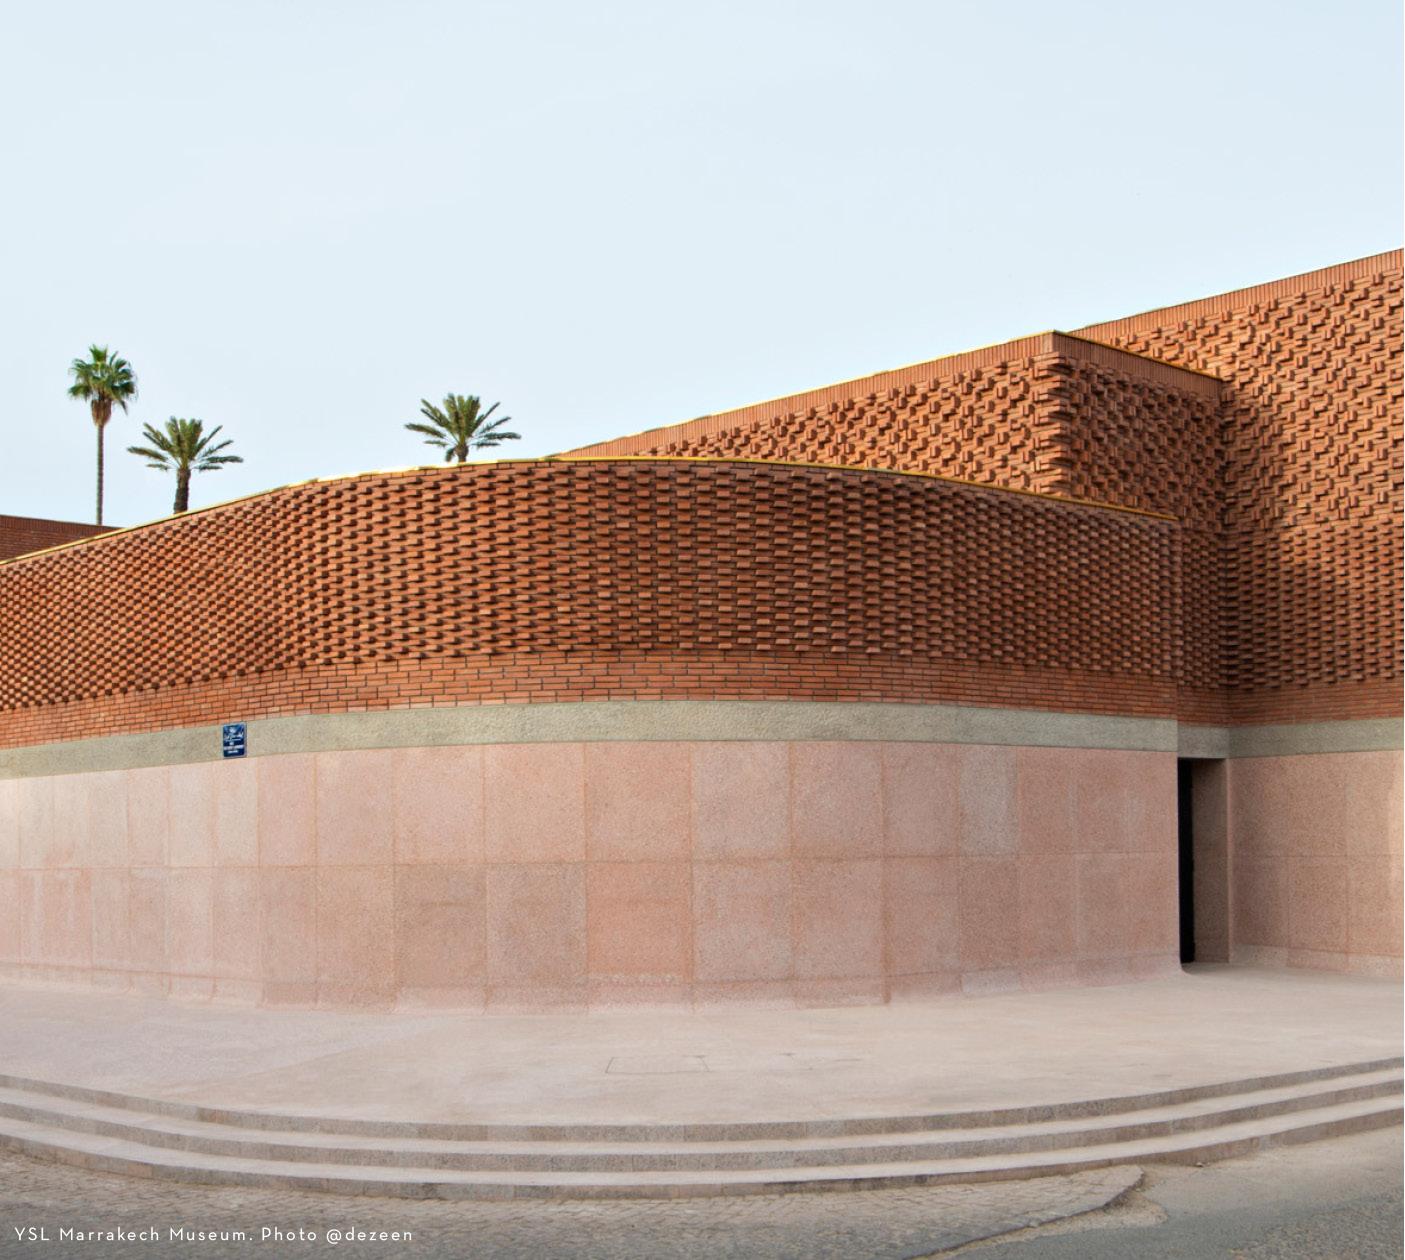 YSL Marrakech Museum - Colour Inspiration